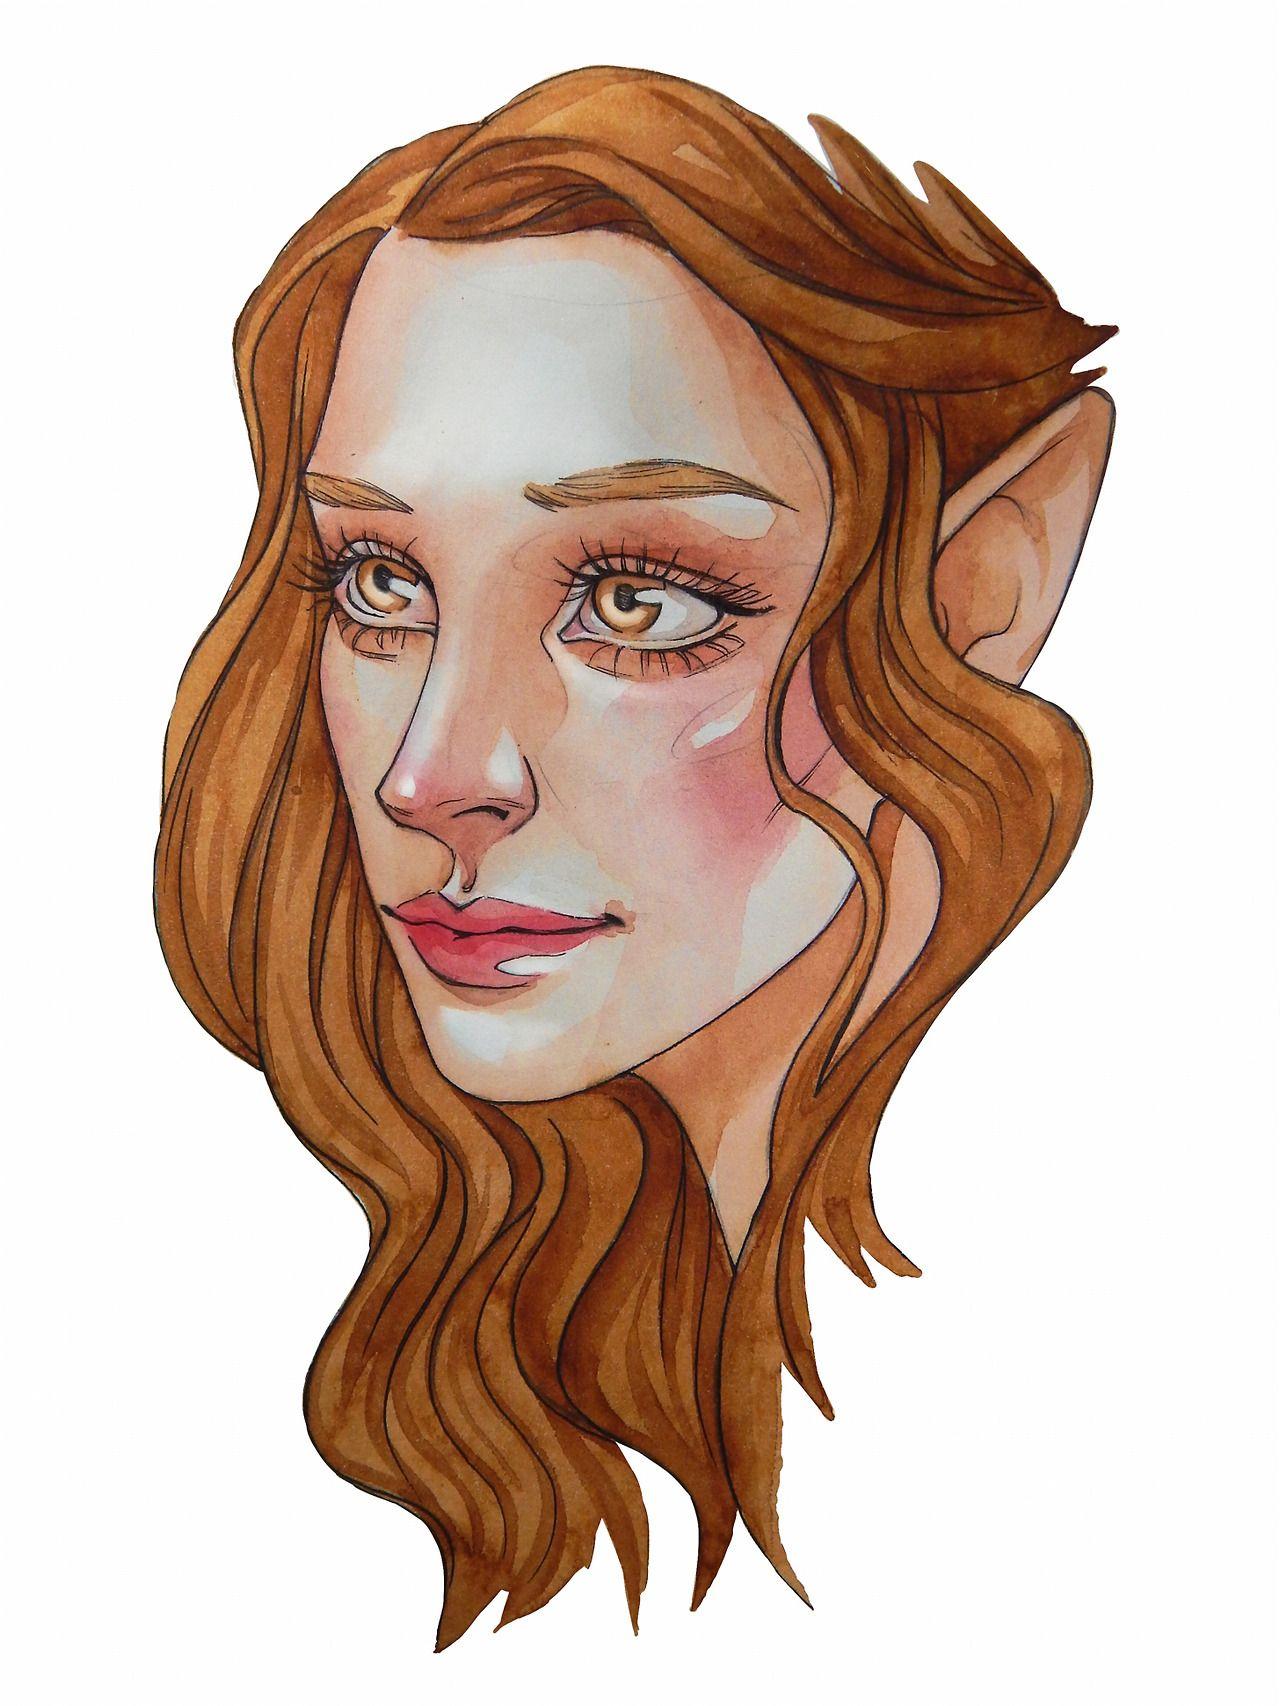 Hello Tumblr Darling Morgana0anagrom Elain Archeron From A